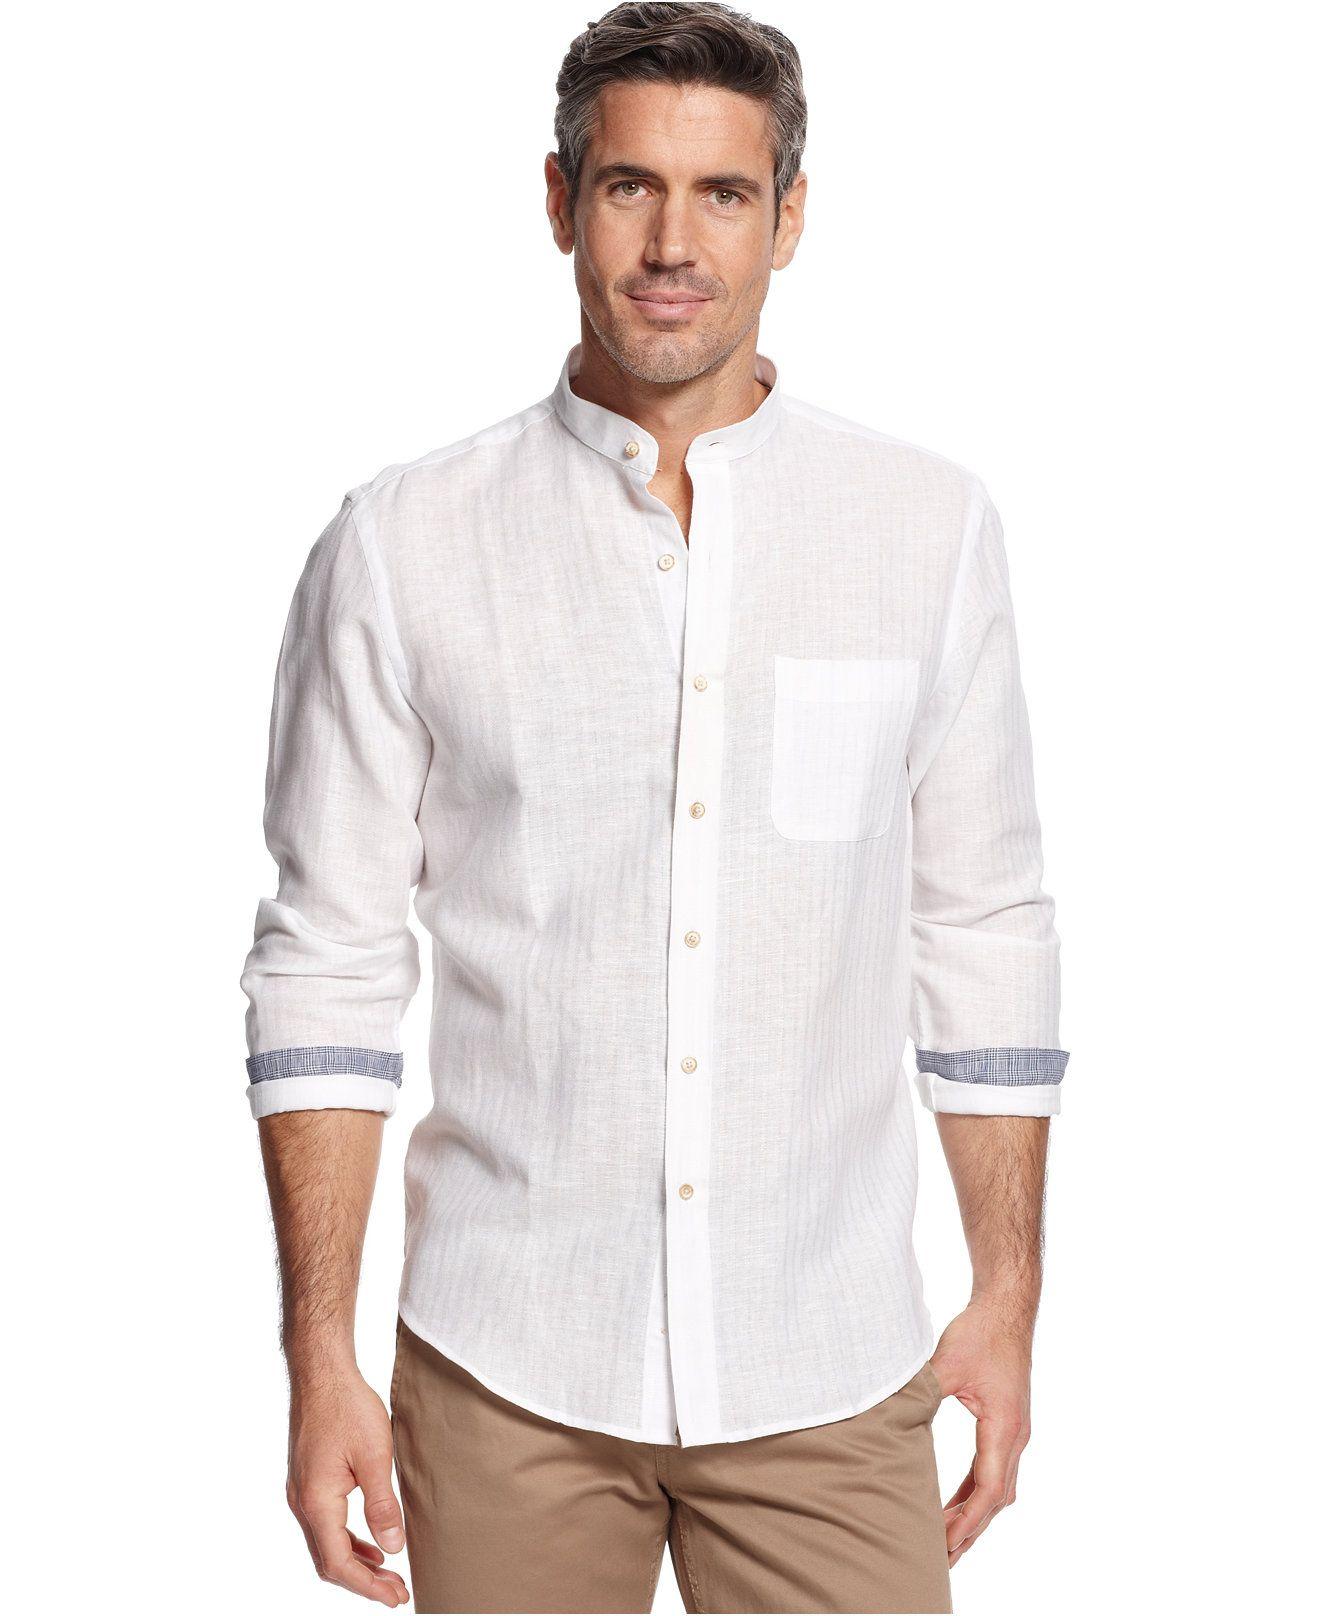 Tasso Elba Island Banded Collar Textured Striped Shirt - Casual ...